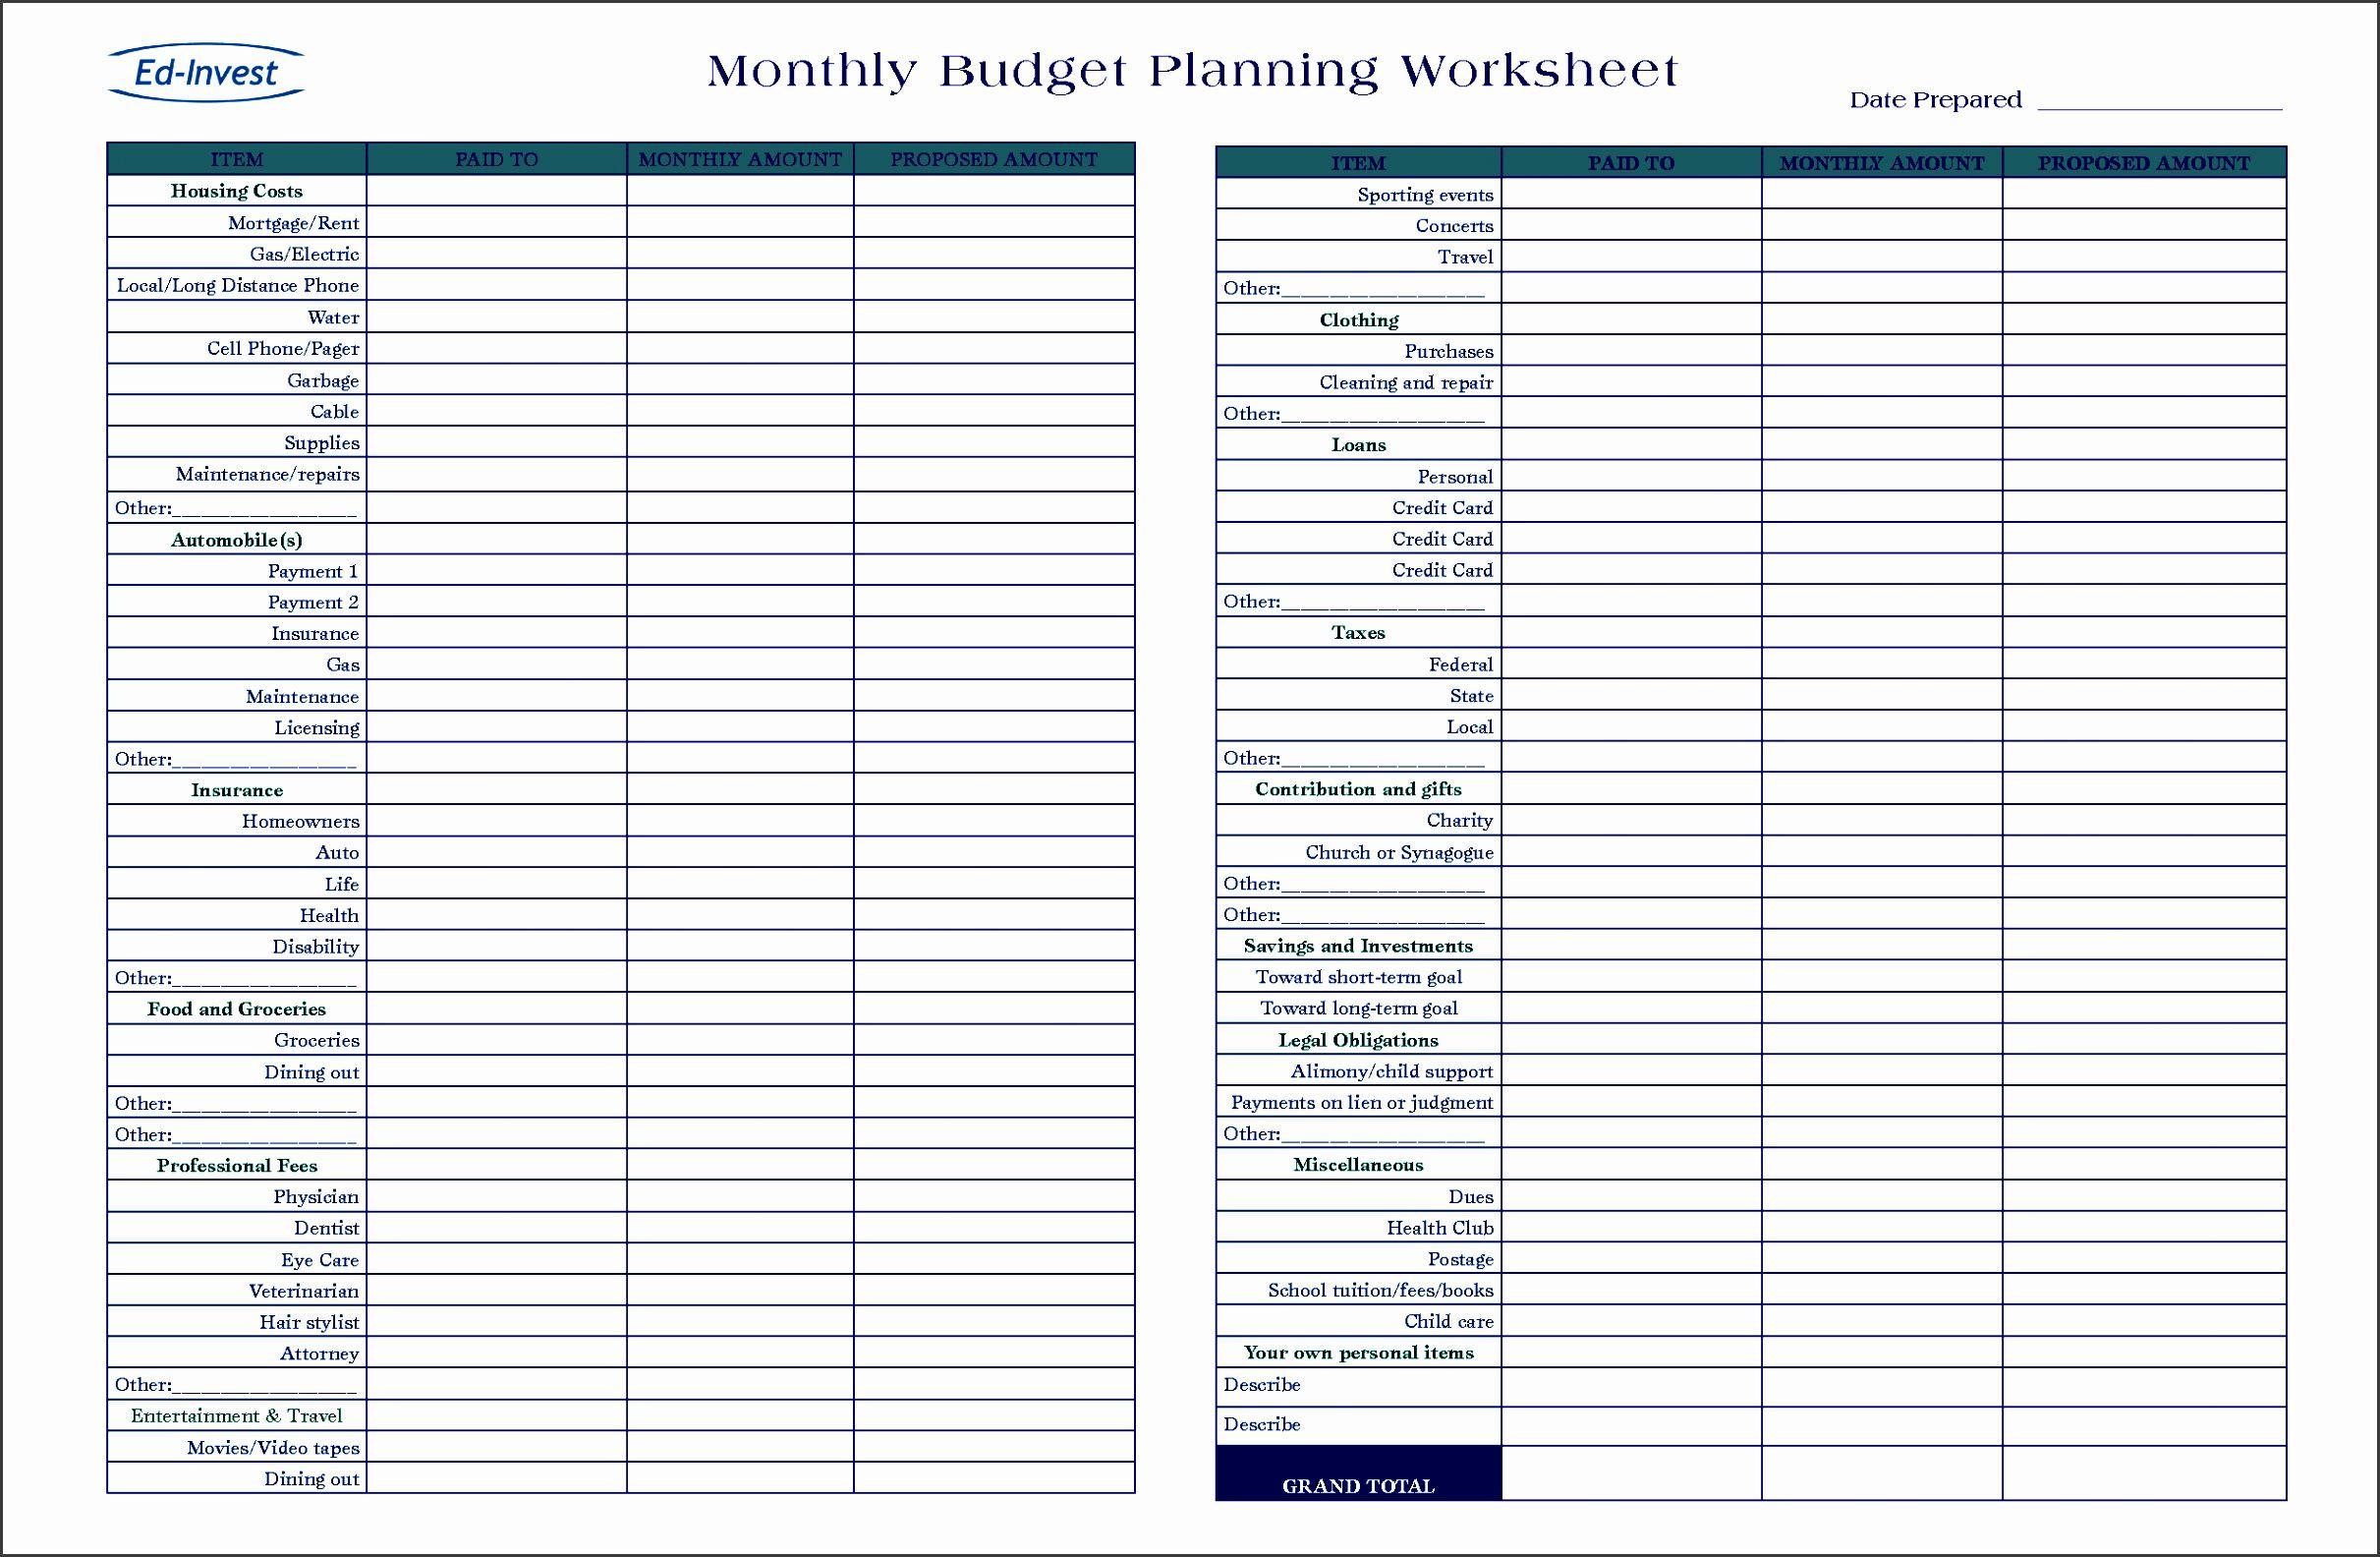 Church Event Planning Checklist Fresh 11 Free Church Event Planning Checklist Temp Event Planning Spreadsheet Financial Plan Template Budget Planning Worksheet